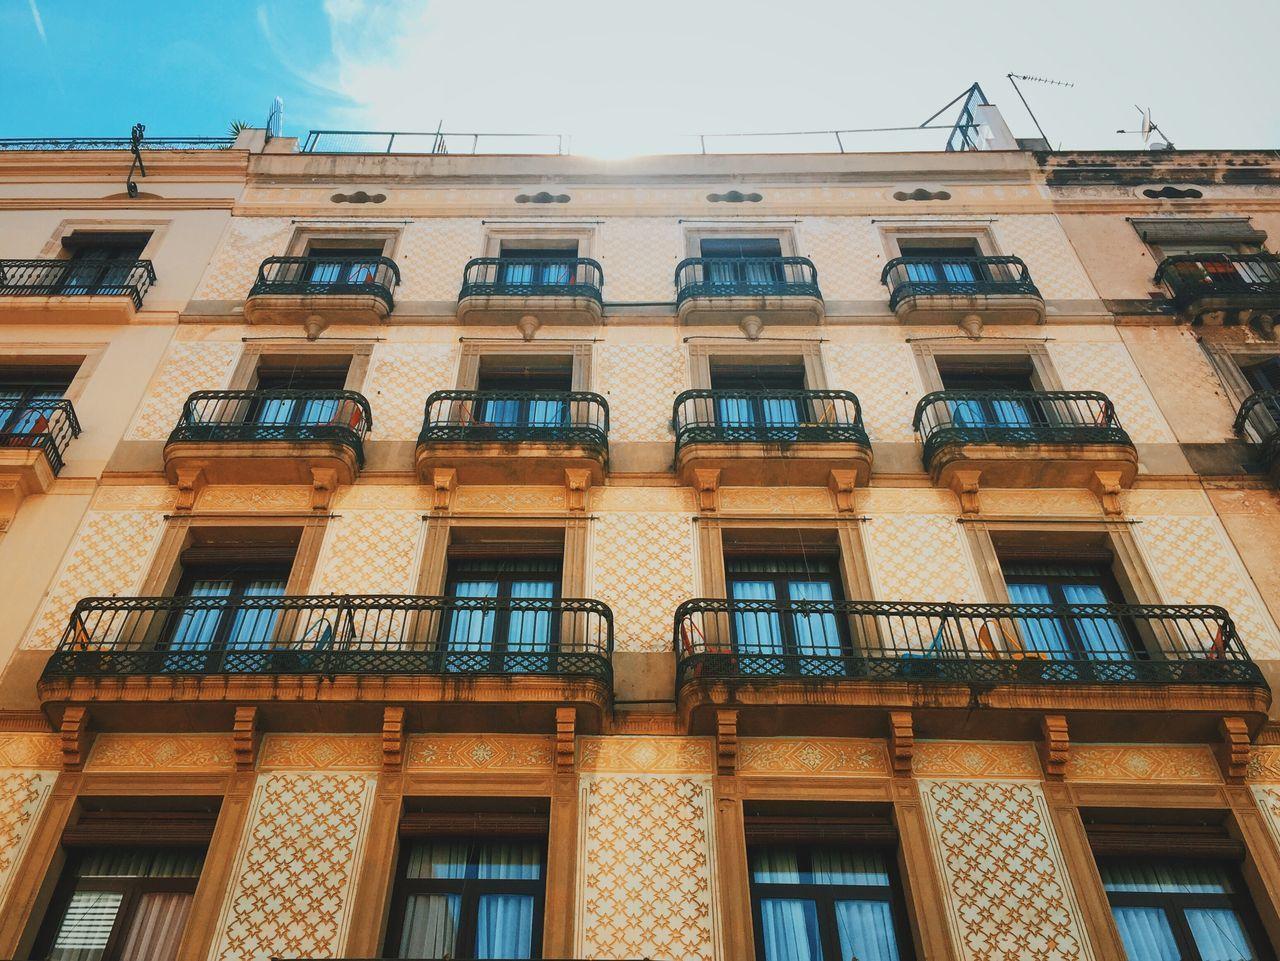 Balconies. Architecture Traveling Wanderlust VSCO Sunshine 43 Golden Moments Vscocam Looking Up